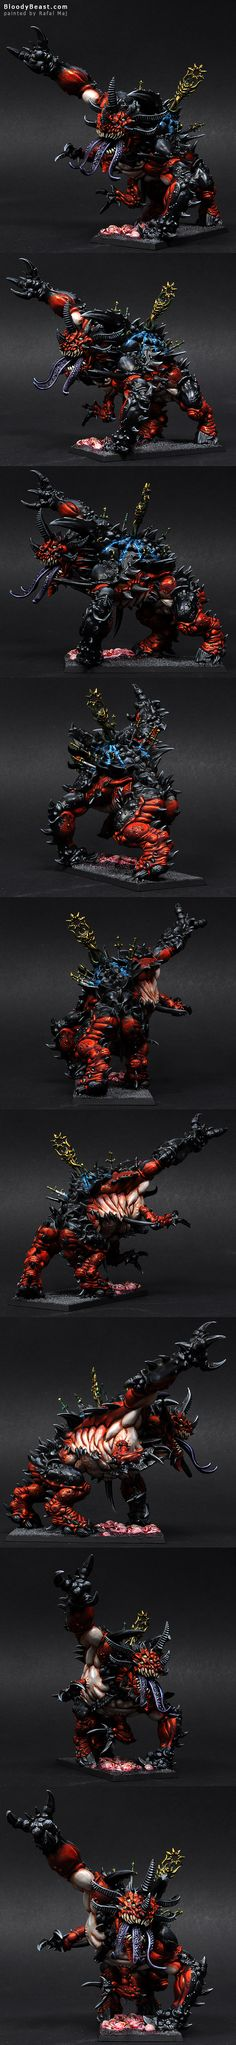 Chaos Slaughterbrute painted by Rafal Maj (BloodyBeast.com)